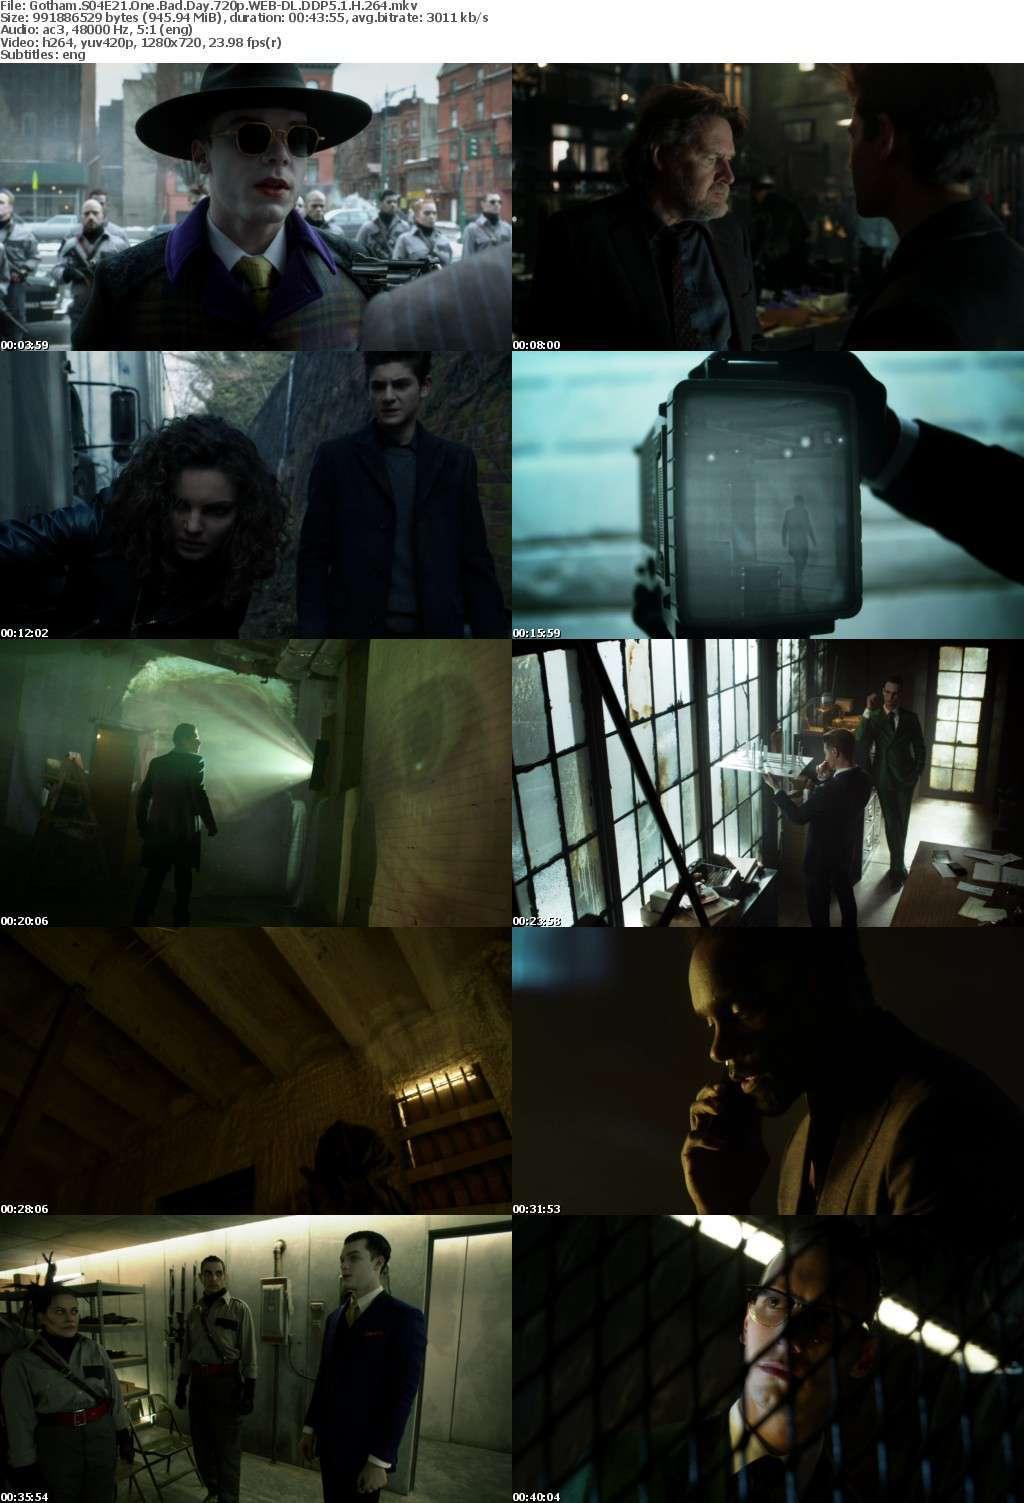 Gotham S04E21 One Bad Day 720p WEB-DL DDP5 1 H 264